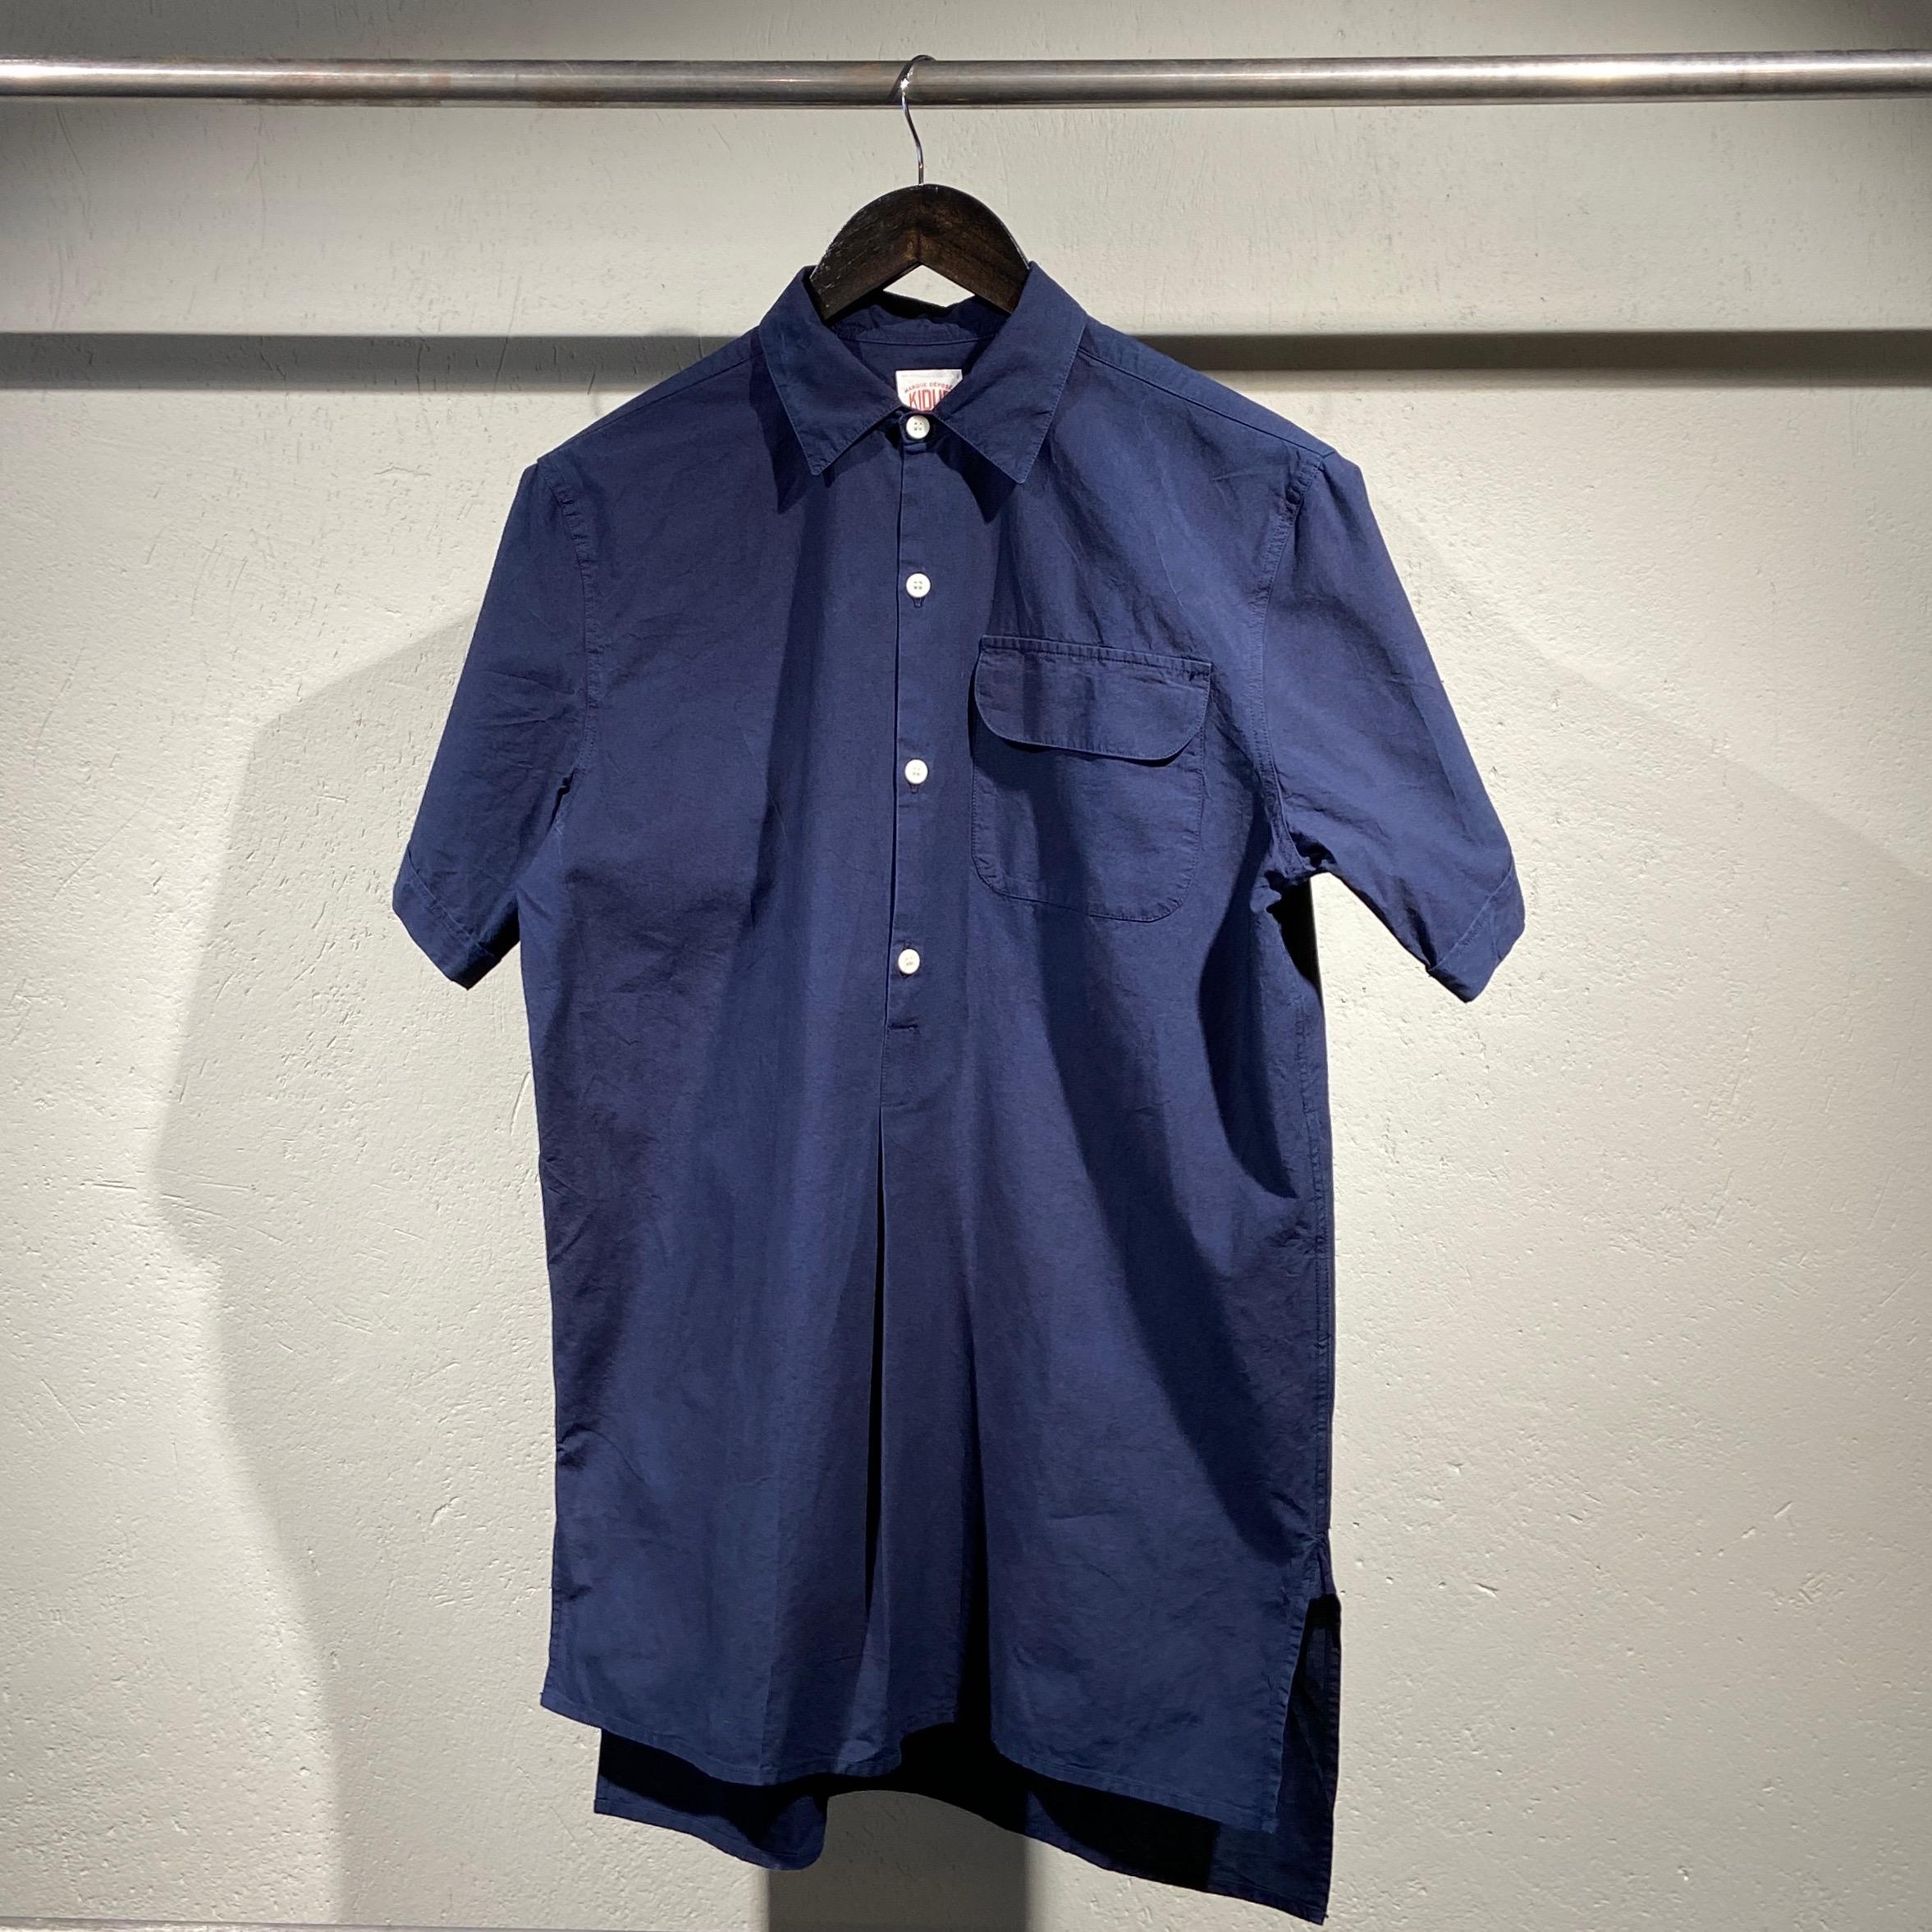 Kidur Blaise Shirt Indigo